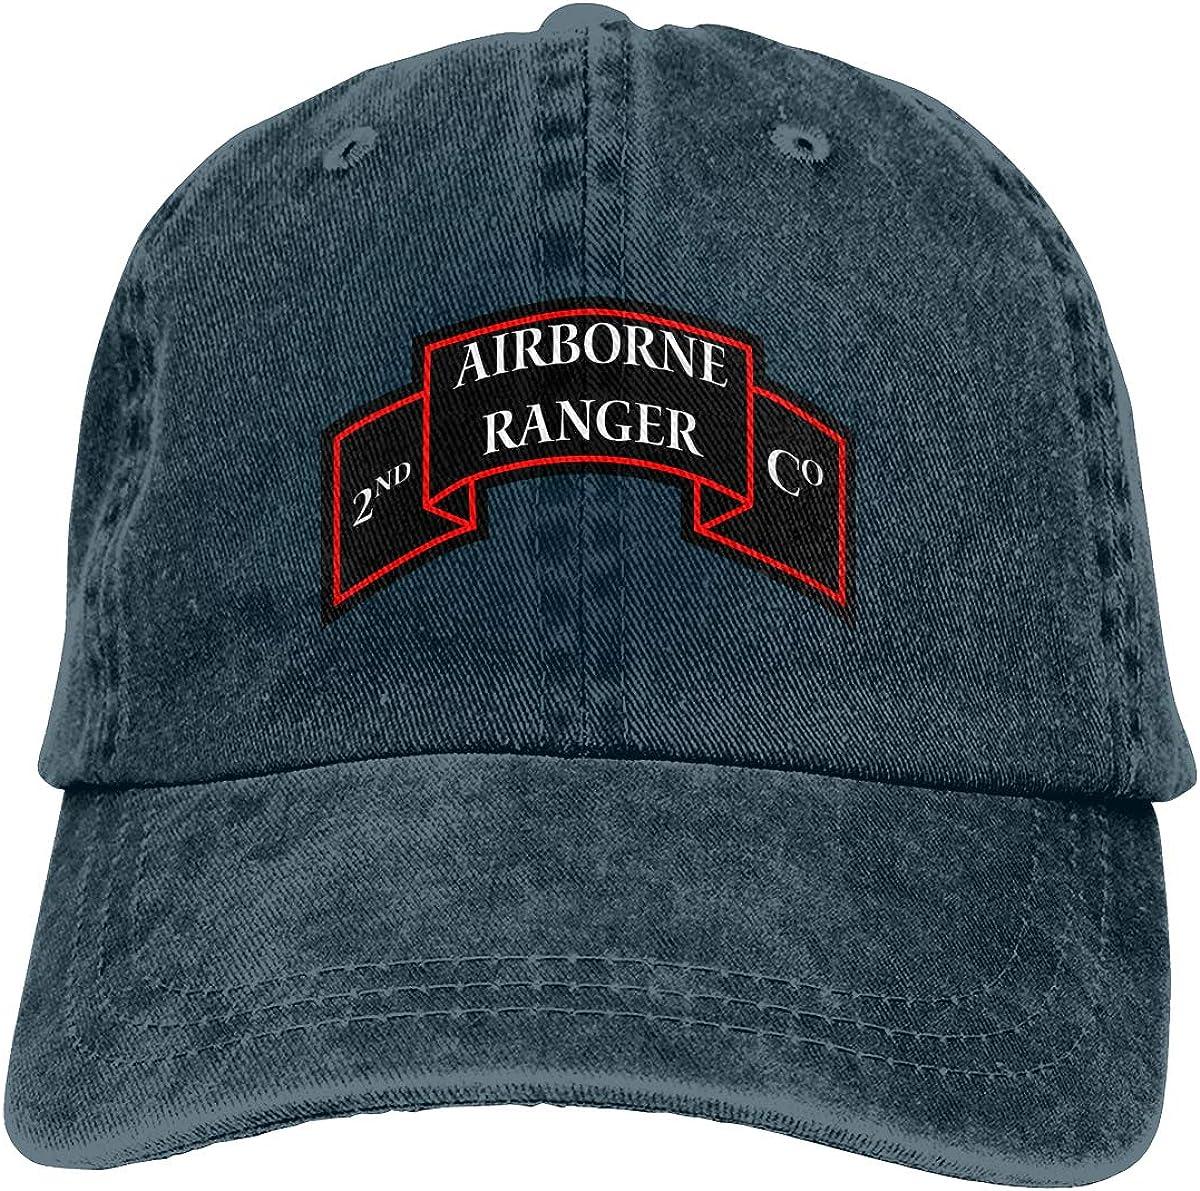 US 2nd Ranger Infantry Company Unisex Adult Baseball Hats Cowboy Hats Denim Hats Dad Hat